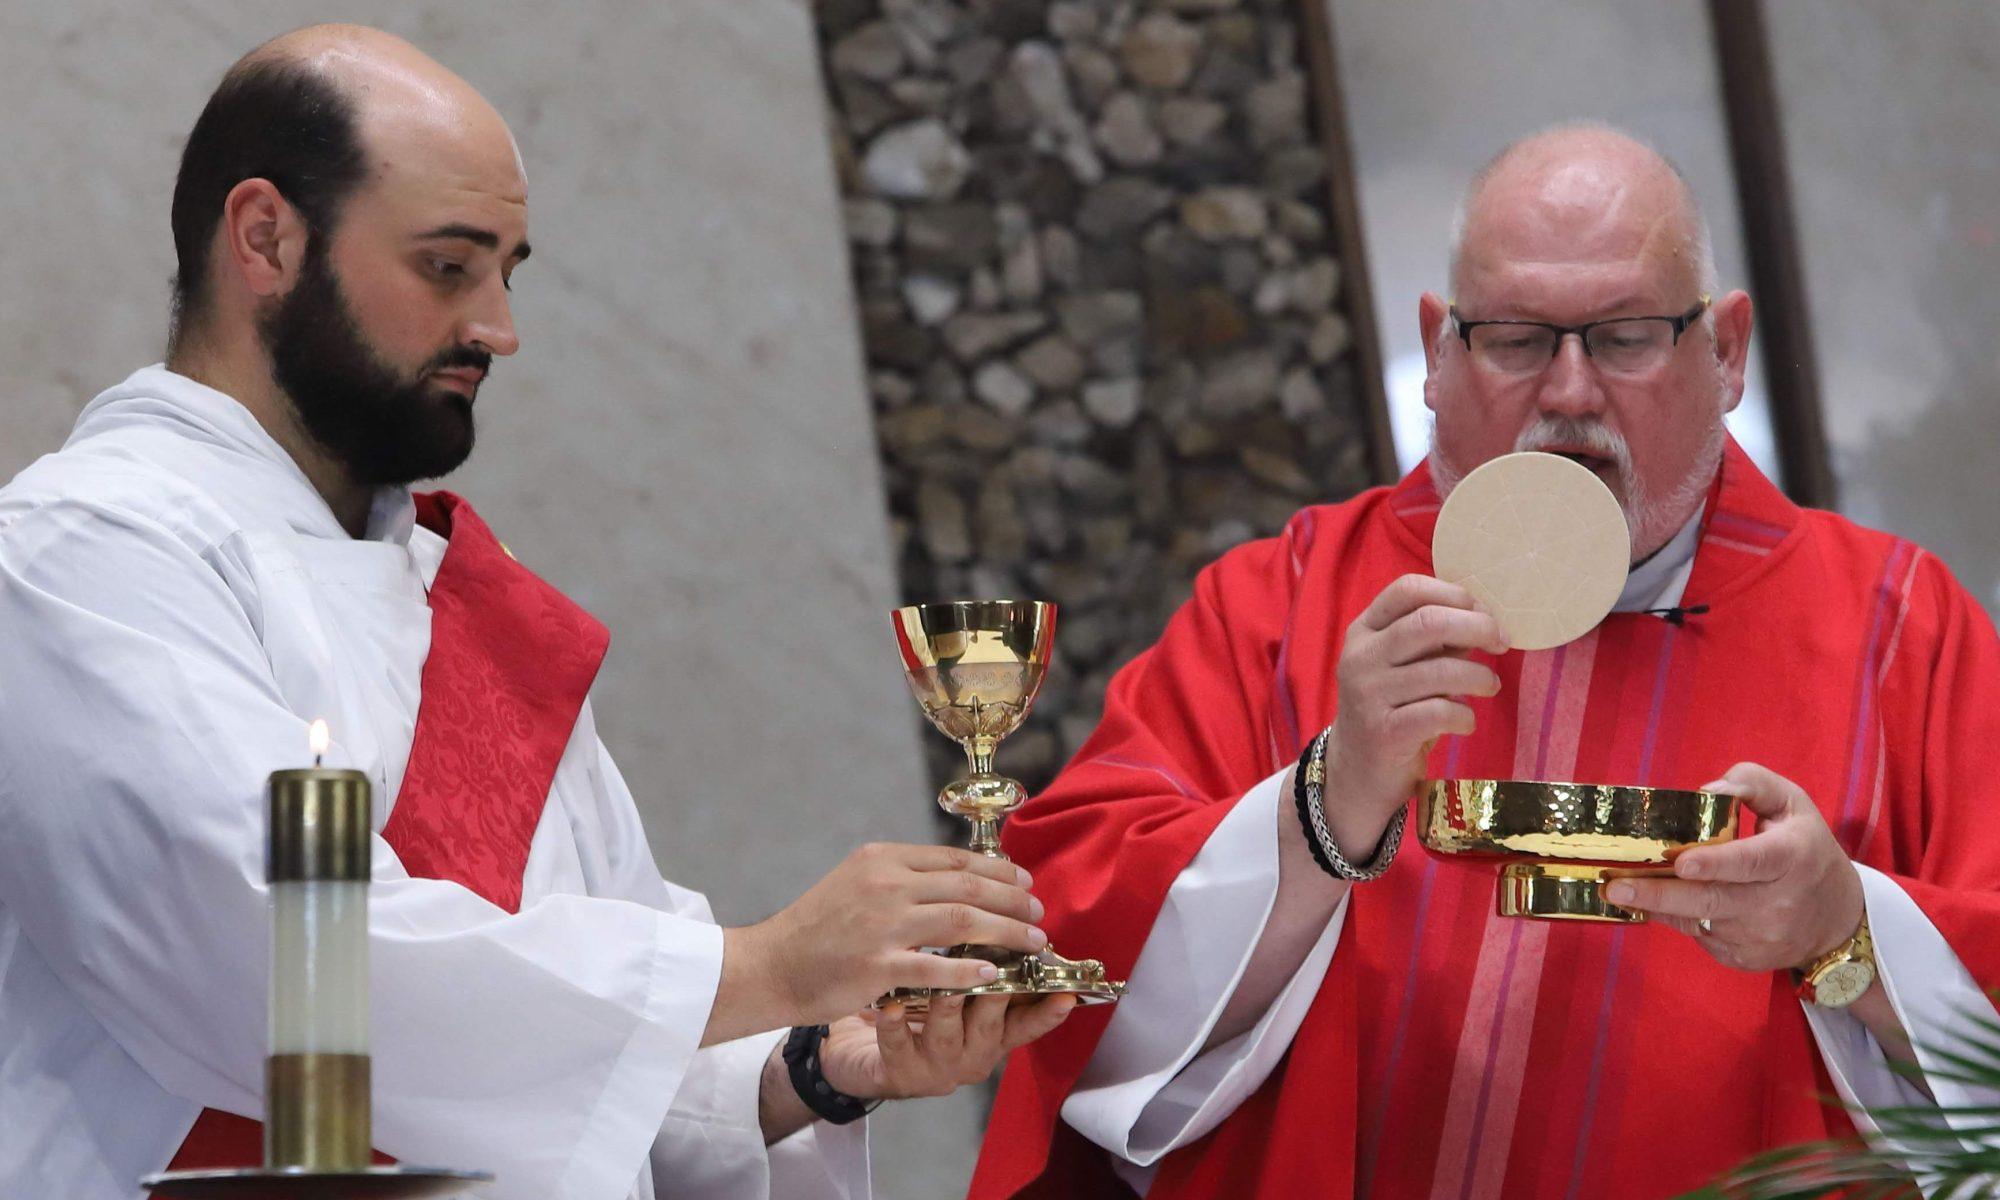 Fr. H Setter and Deacon Matt Siegman elevate the Eucharist.